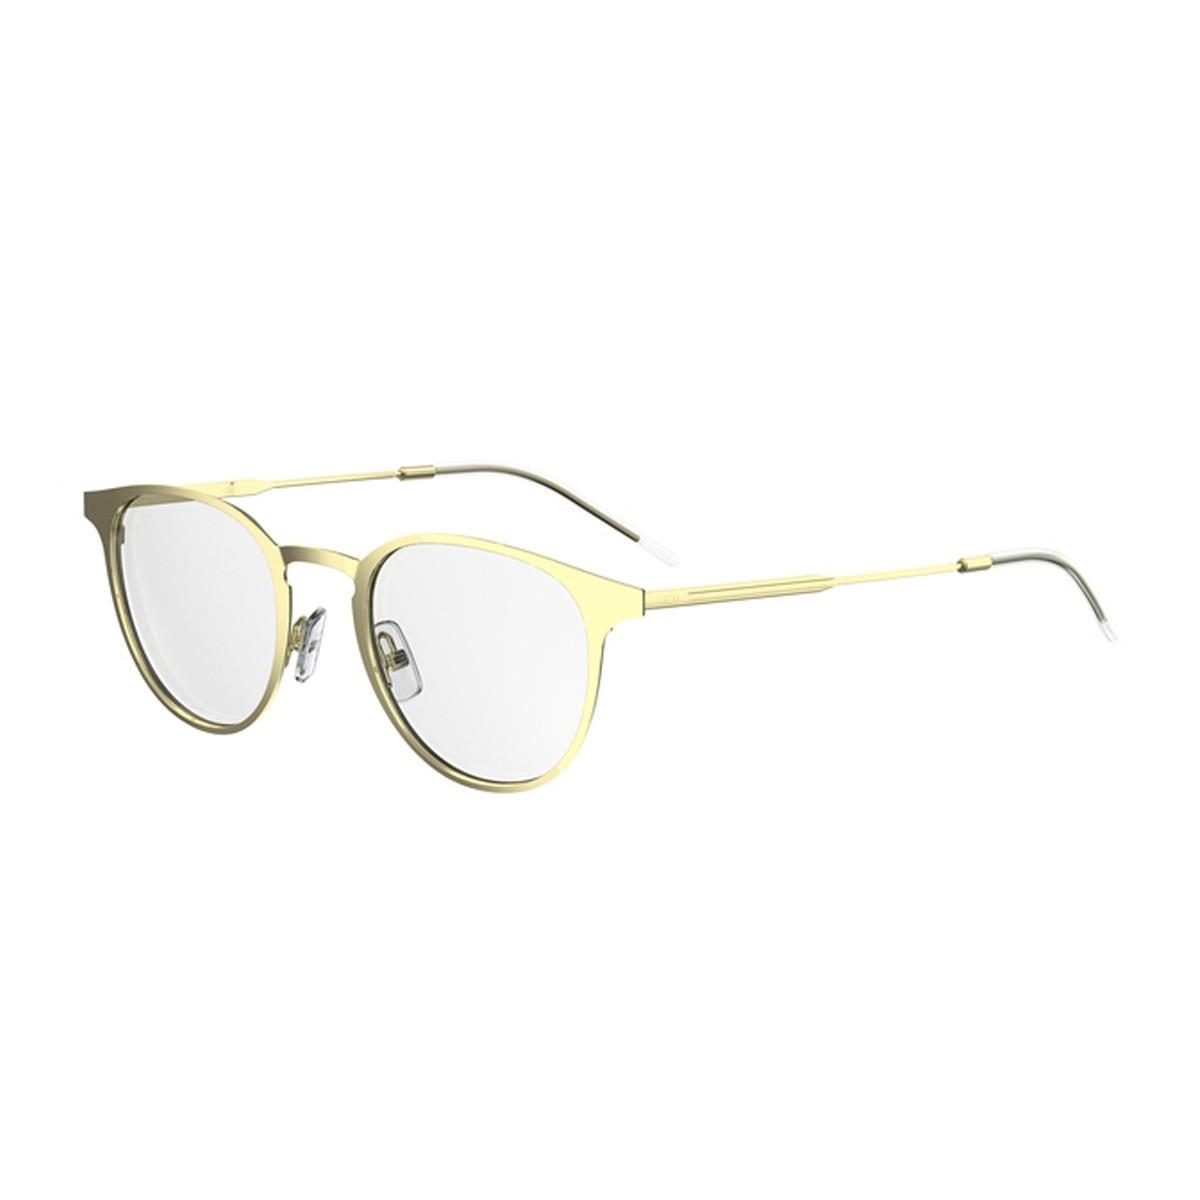 Dior 0203   Men's eyeglasses